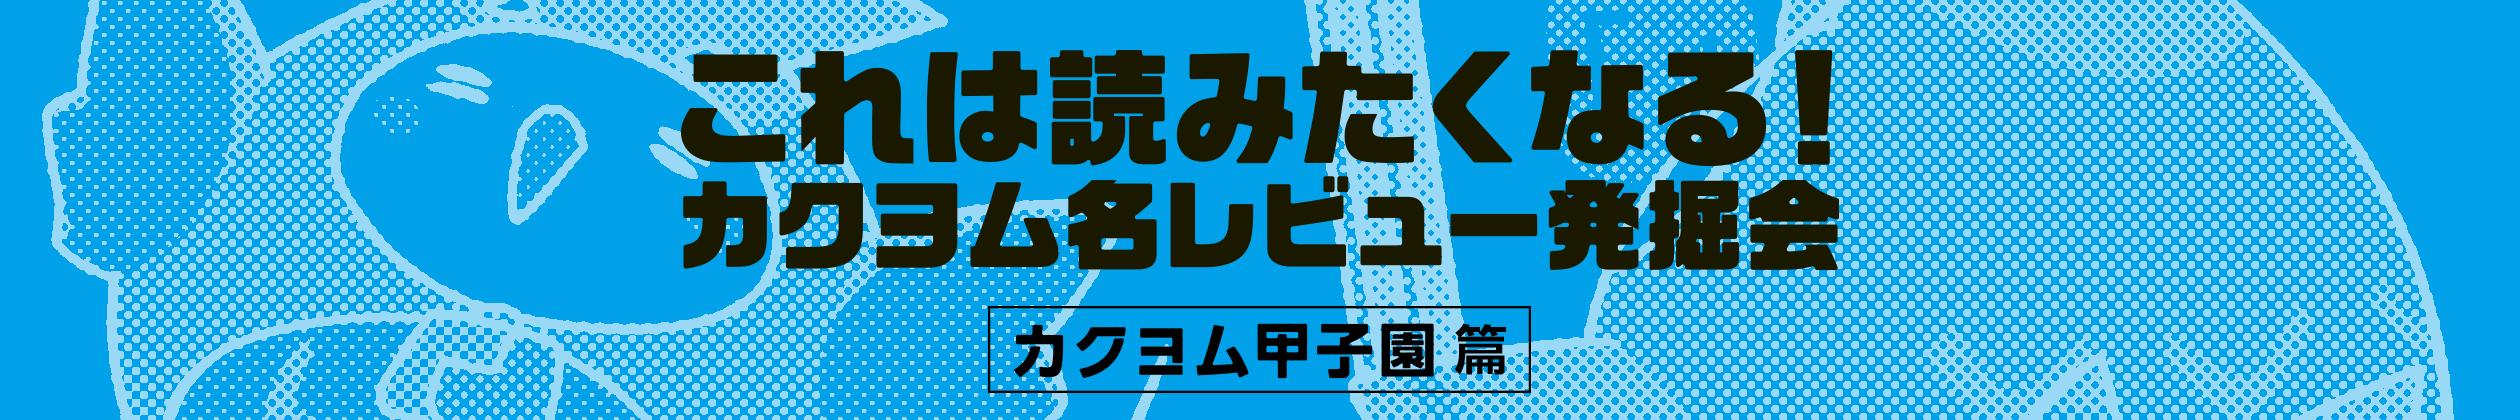 https://cdn-ak2.f.st-hatena.com/images/fotolife/k/kadokawa-toko/20170804/20170804171325.jpg